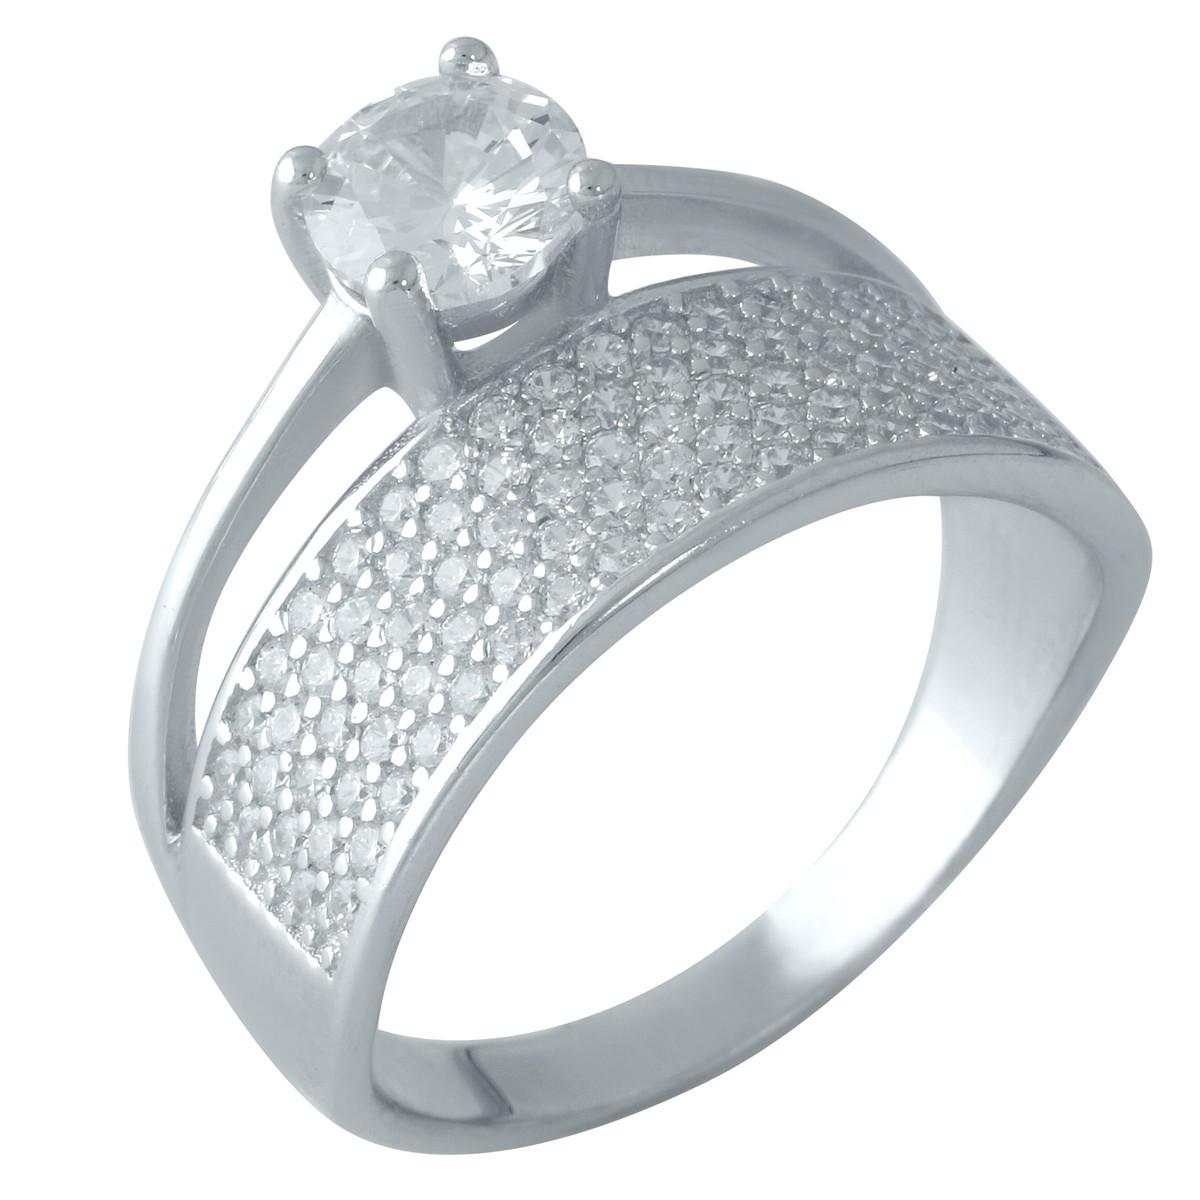 Серебряное кольцо DreamJewelry с фианитами (1955826) 16 размер